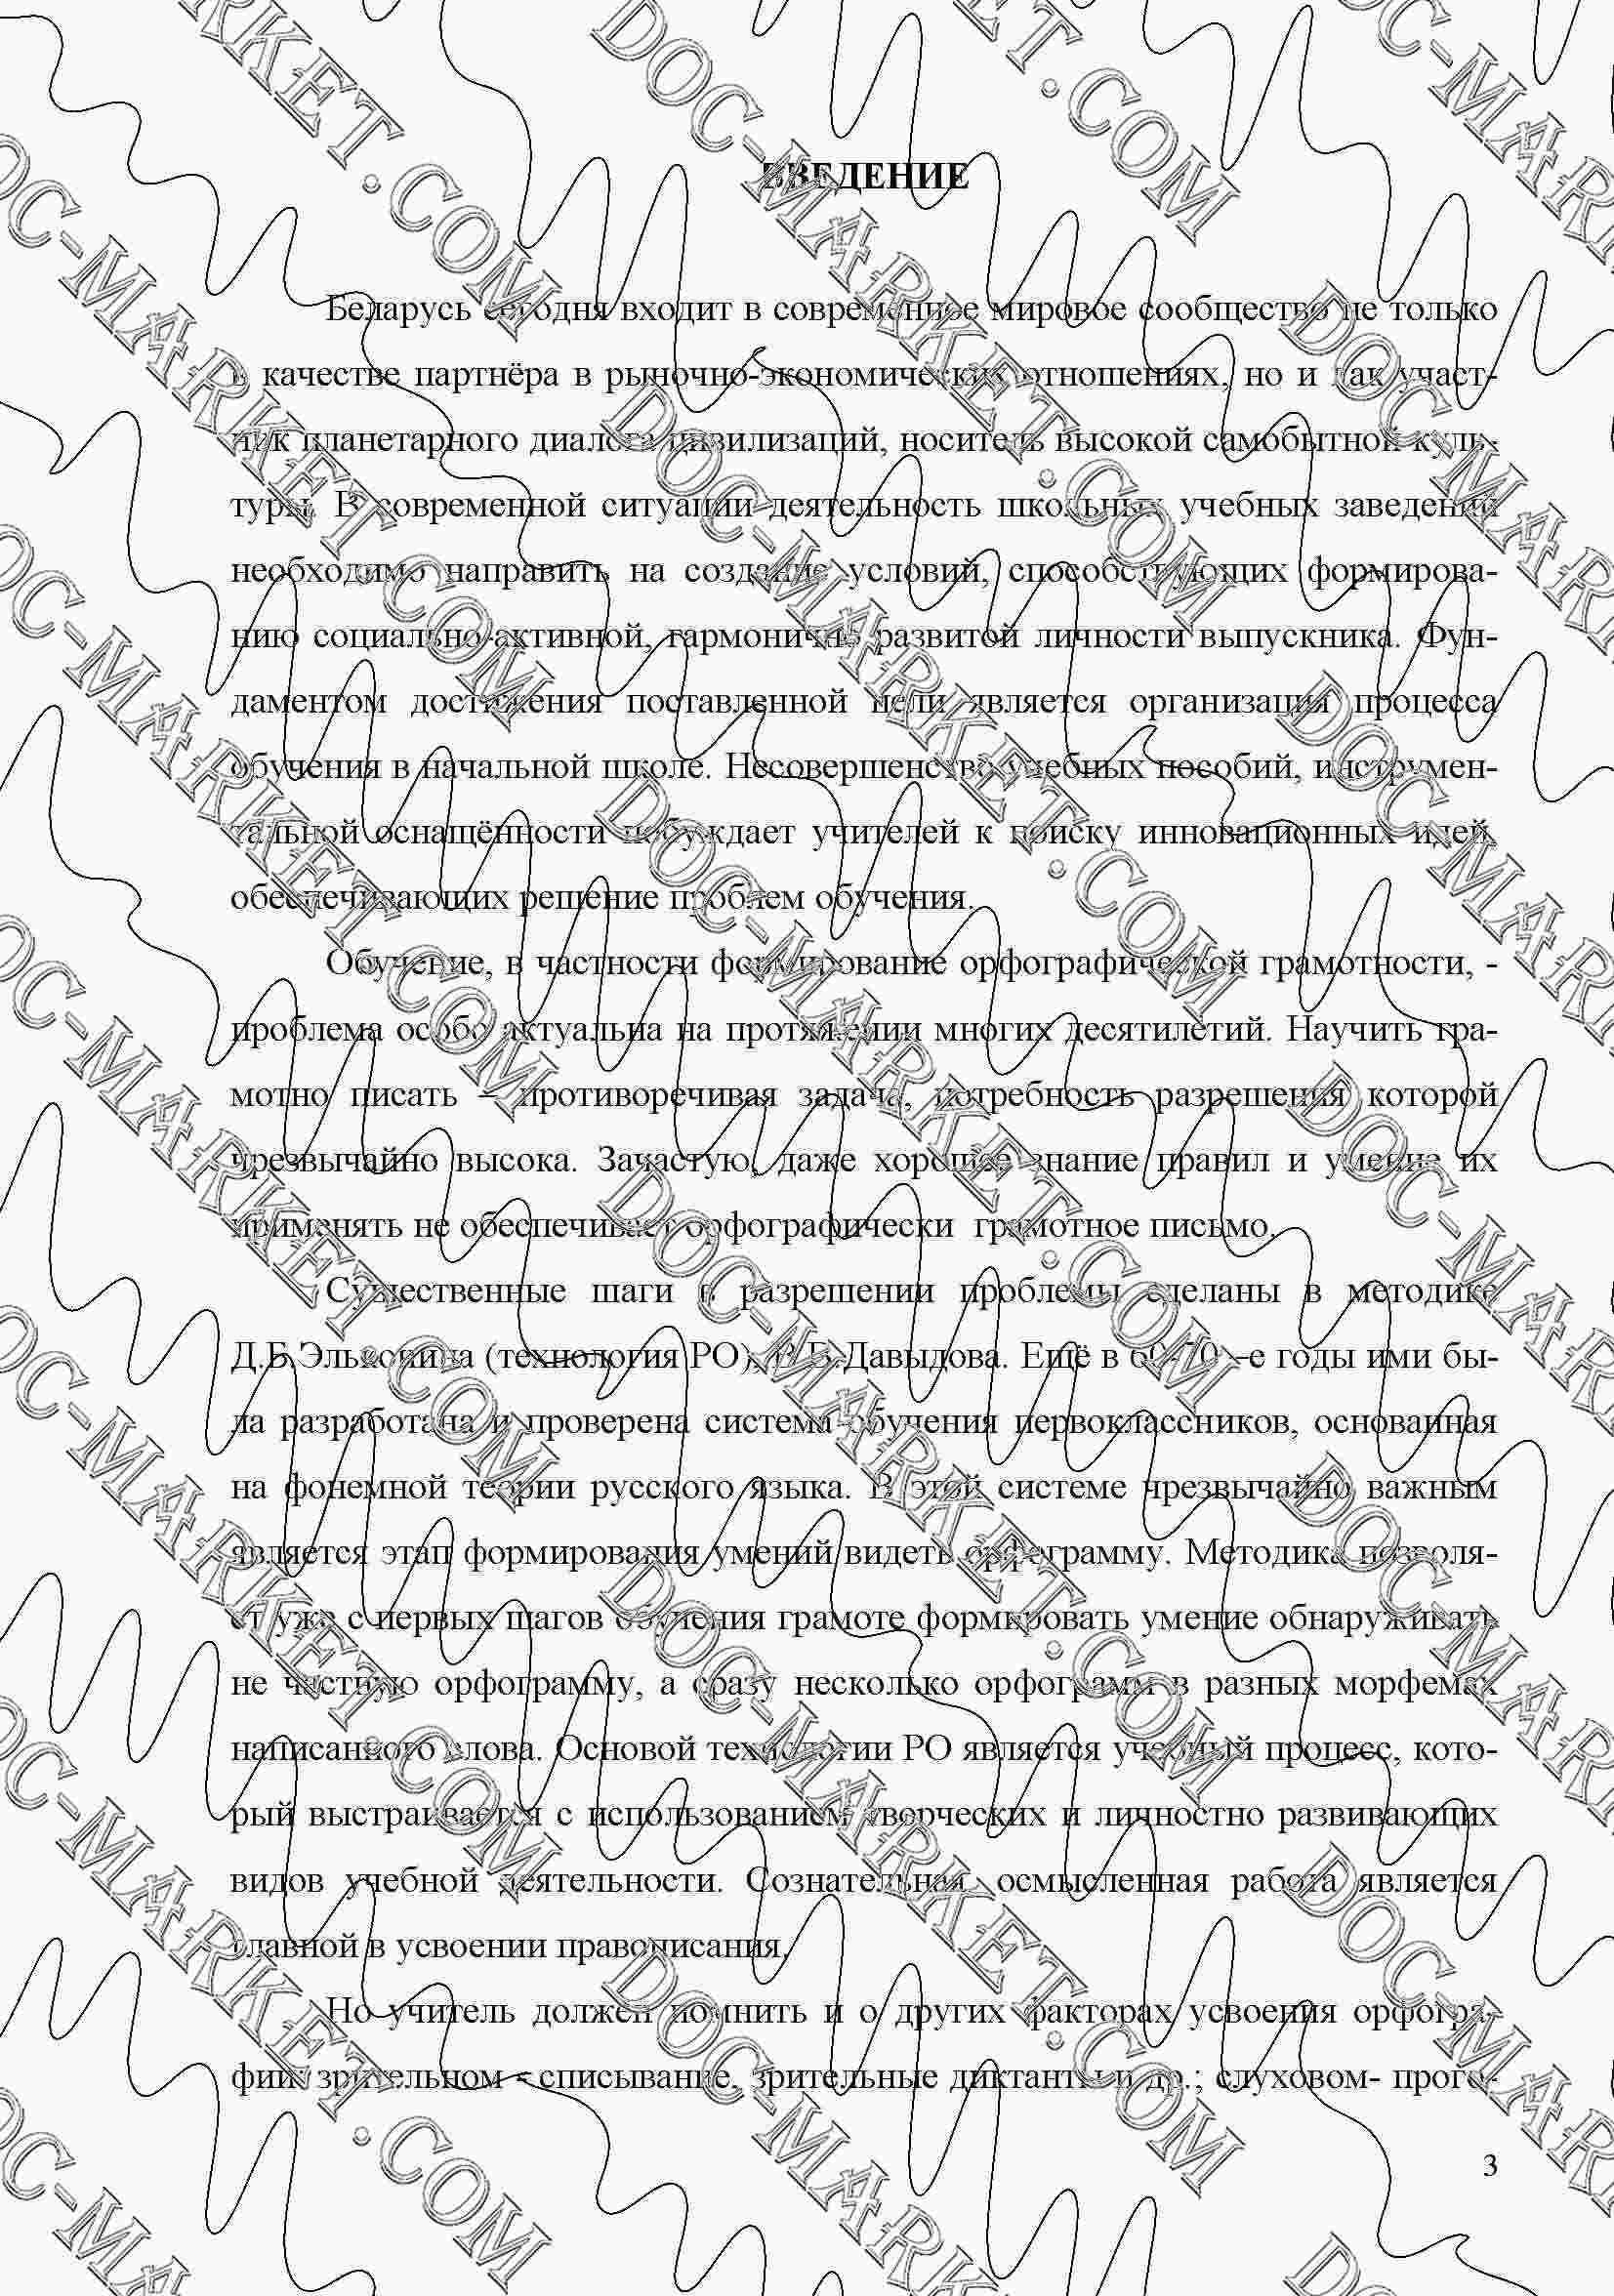 college essays Анализ контрольного диктанта Анализ контрольного диктанта